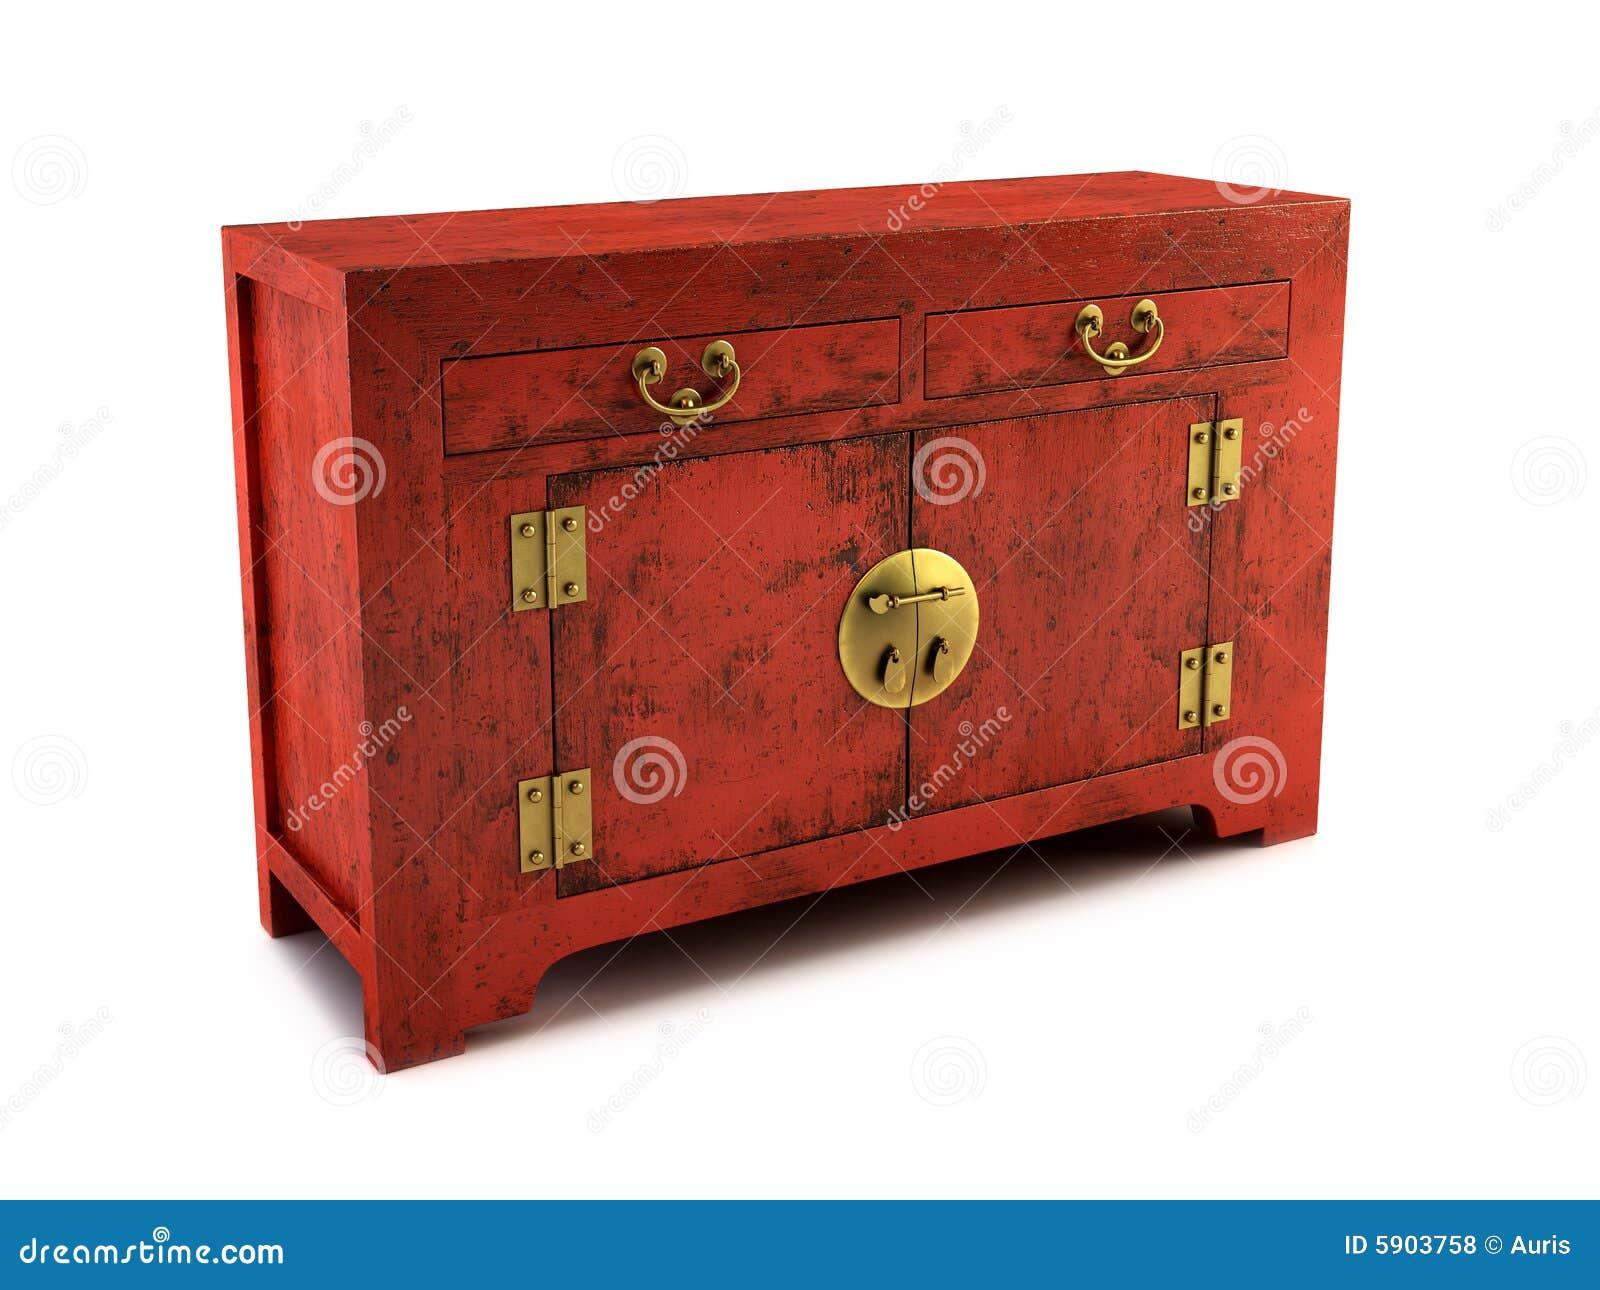 bureau 3d rendering royalty free stock photos image 5903758. Black Bedroom Furniture Sets. Home Design Ideas